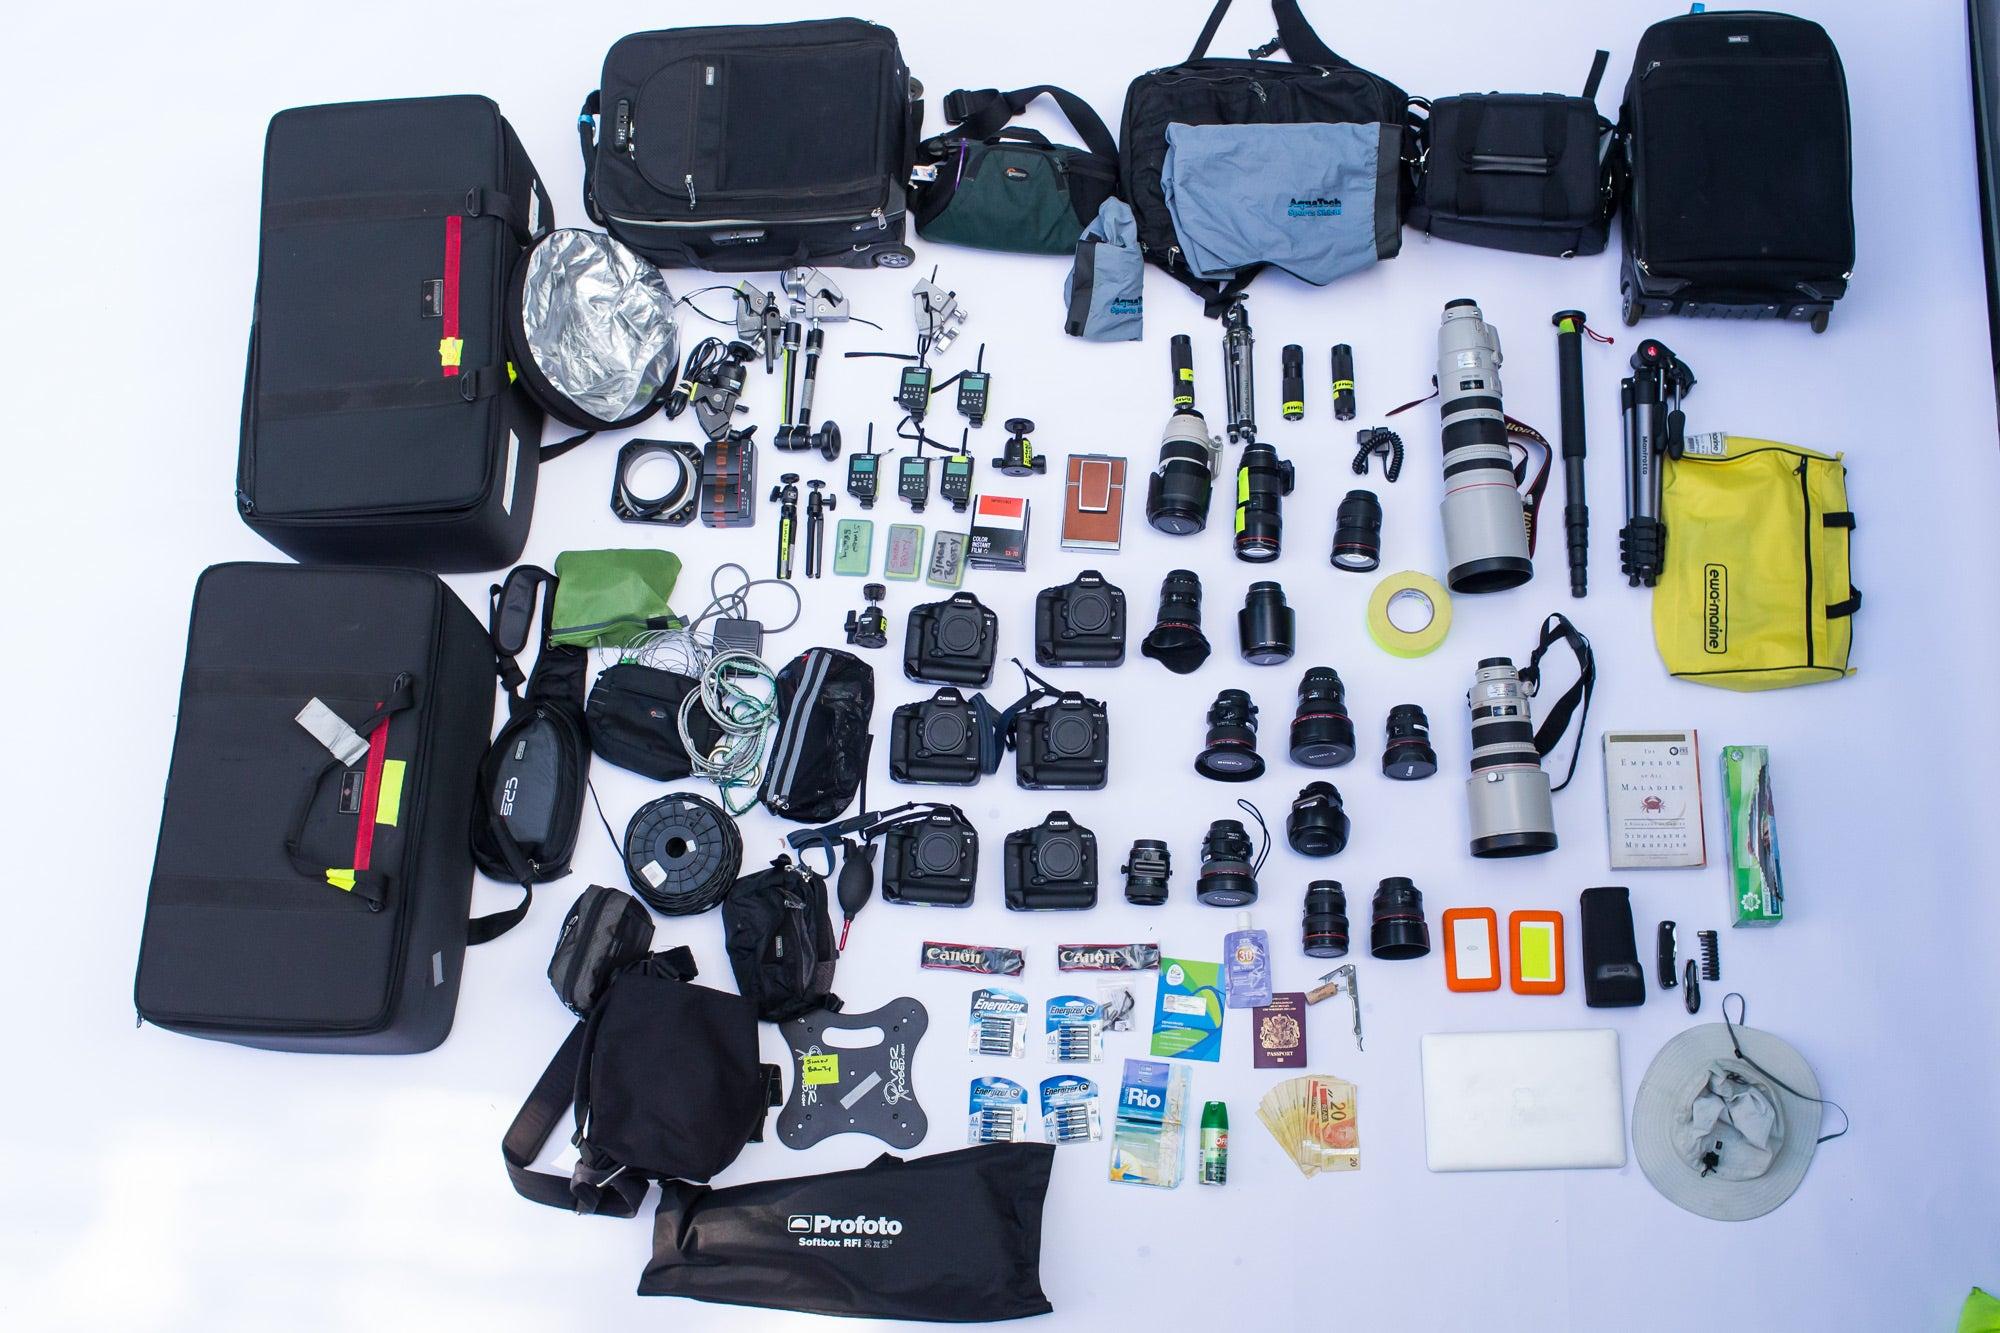 Simon Bruty's sports photography kit for Rio